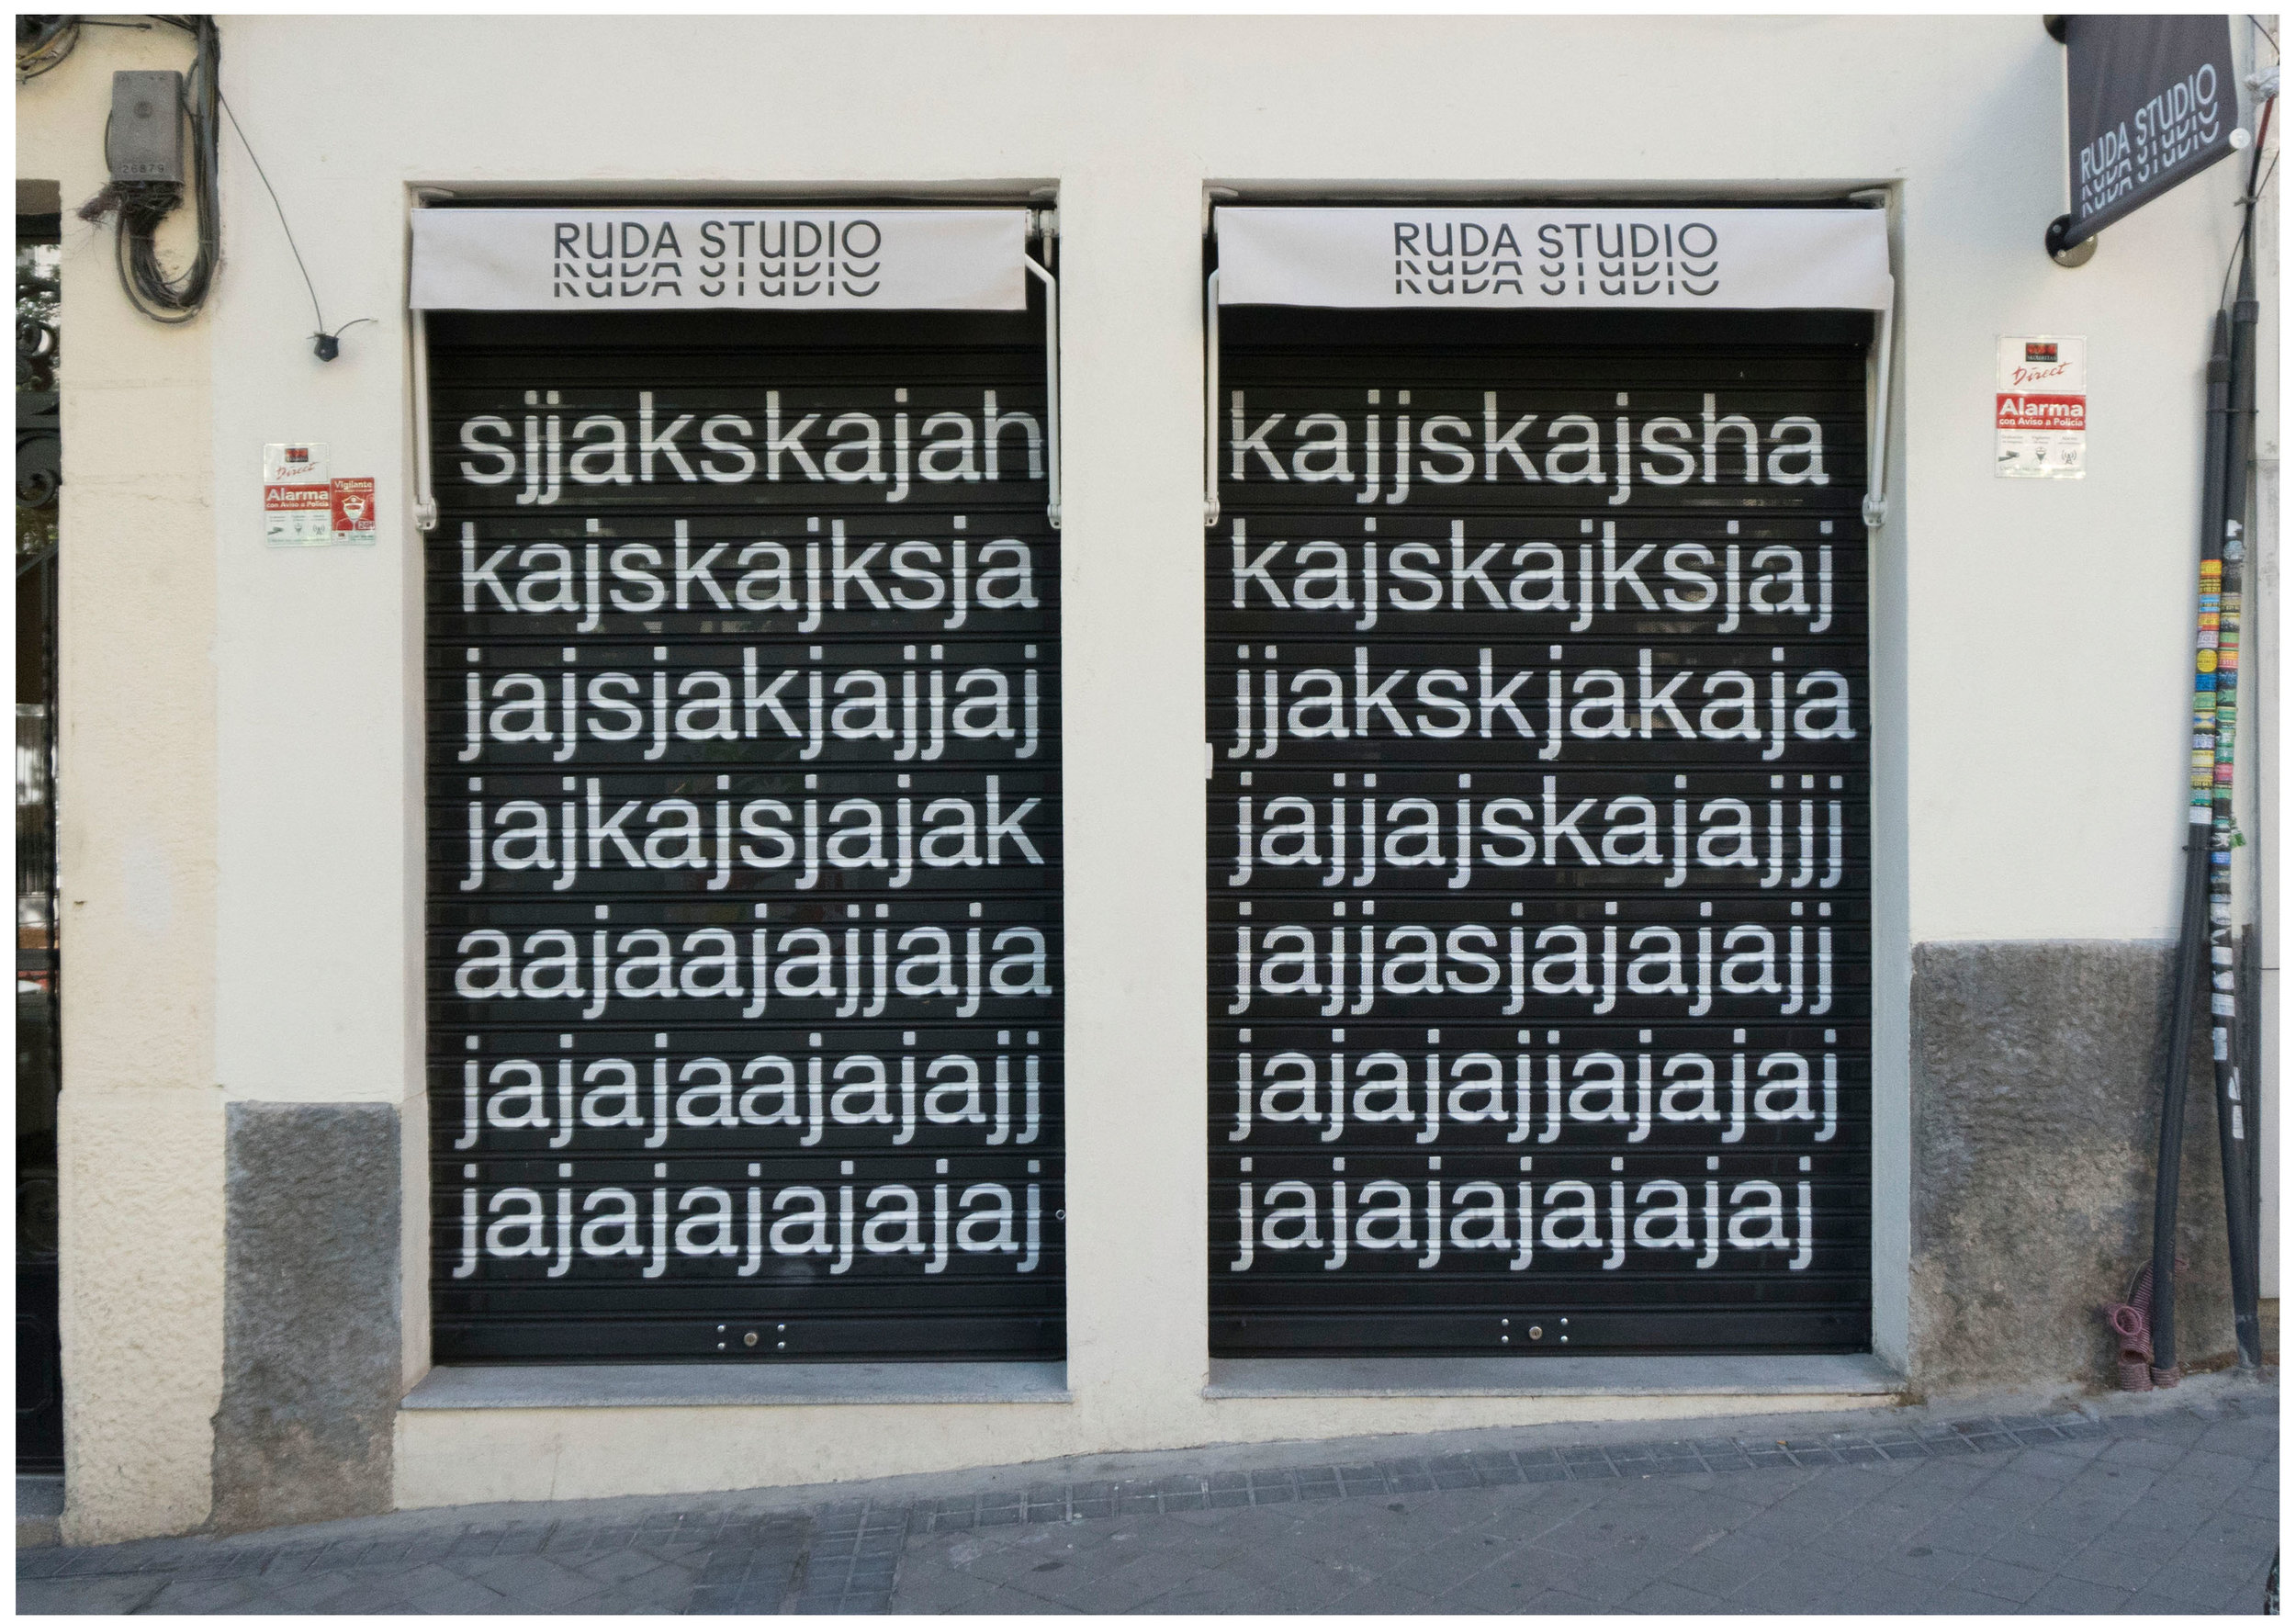 About curtains, expectancy and ajkjaskjasjkhsakjhsa